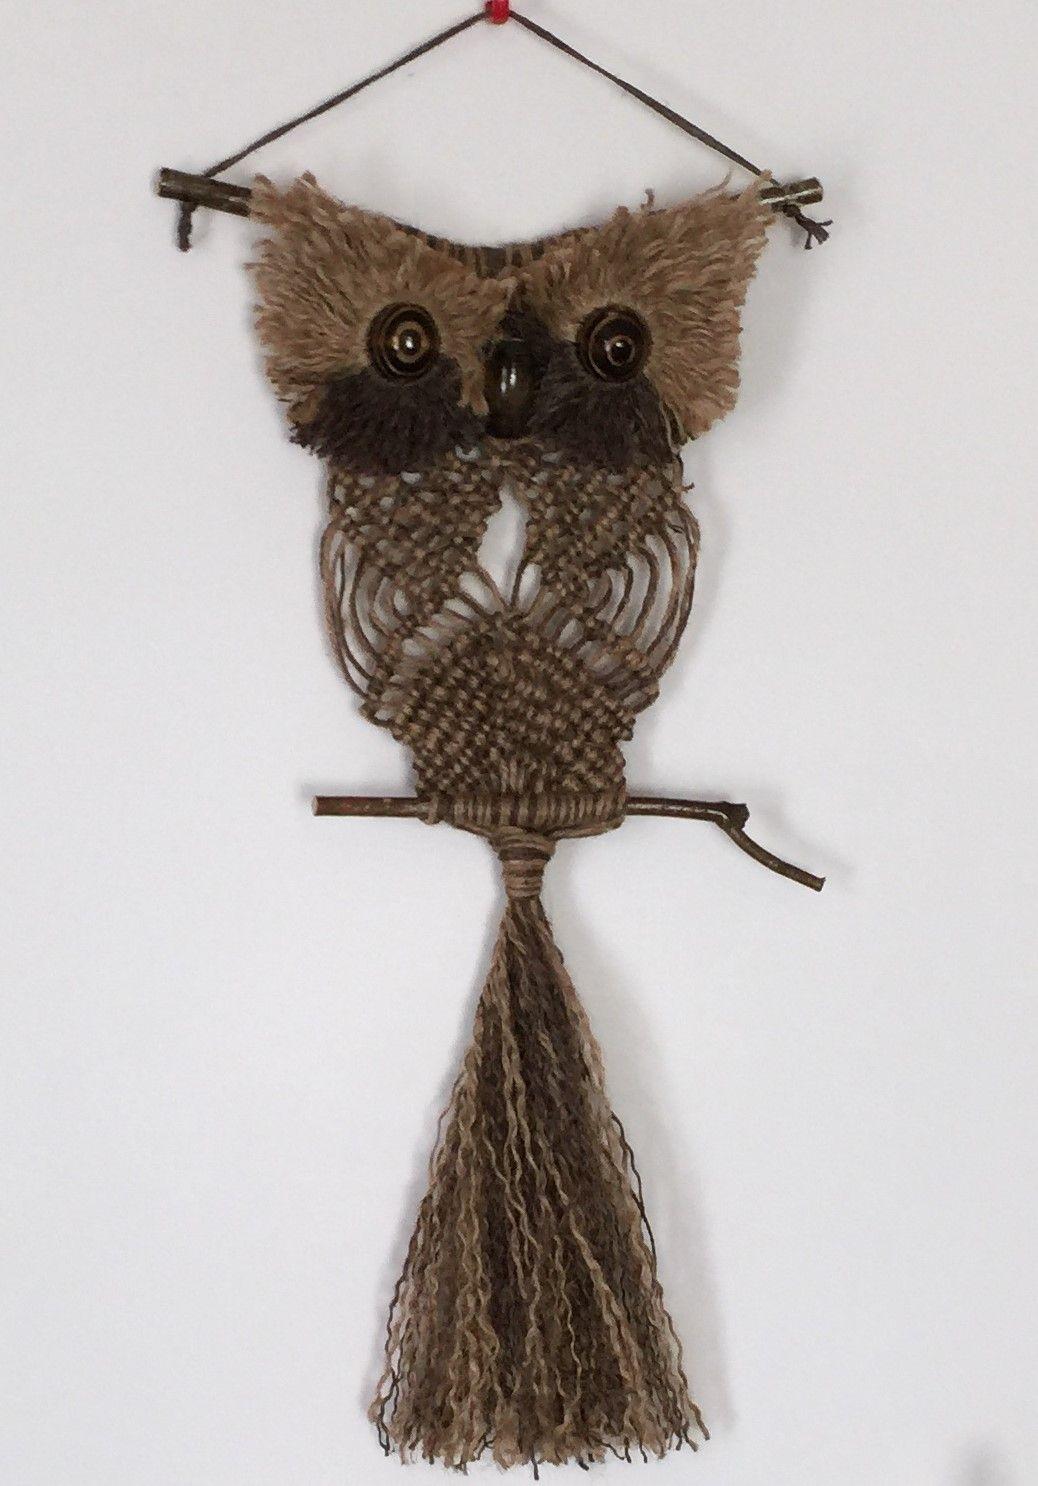 OWL #118 Macrame Wall Hanging, natural jute, macrame owl